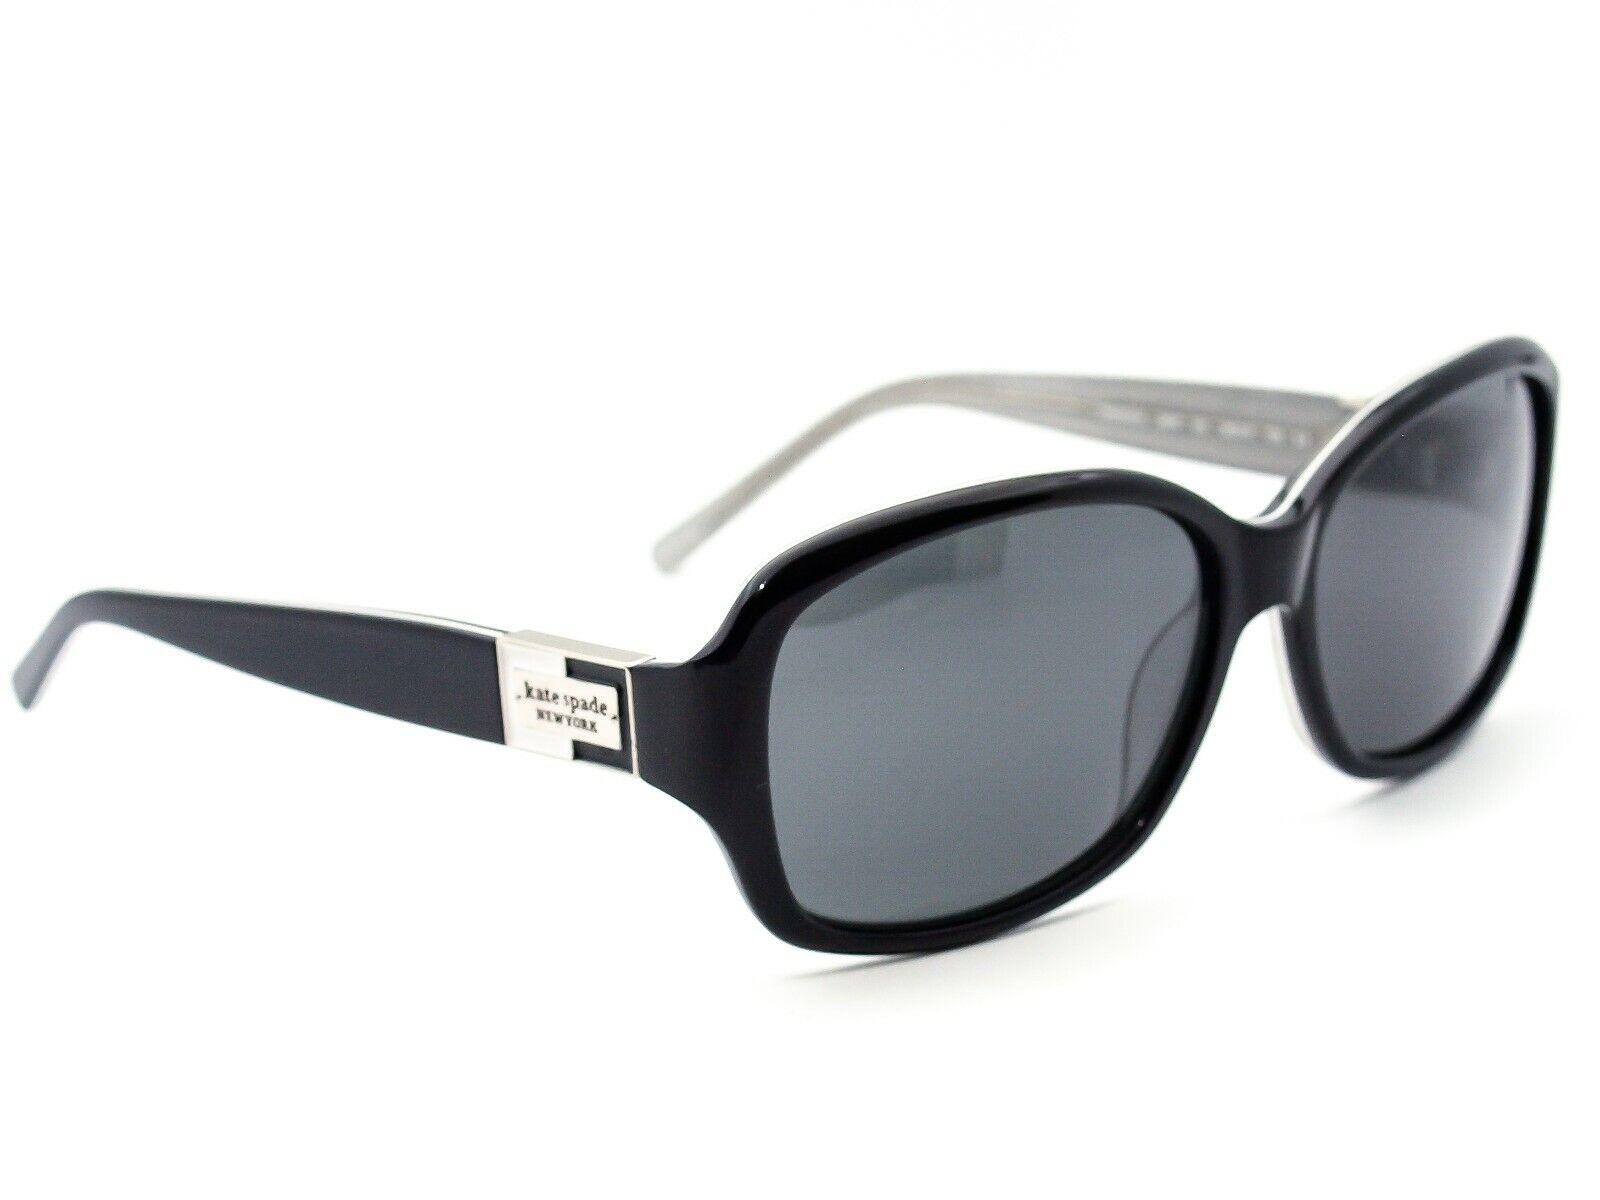 Kate Spade Women's Sunglasses Annika/S JBHP RA 6-6